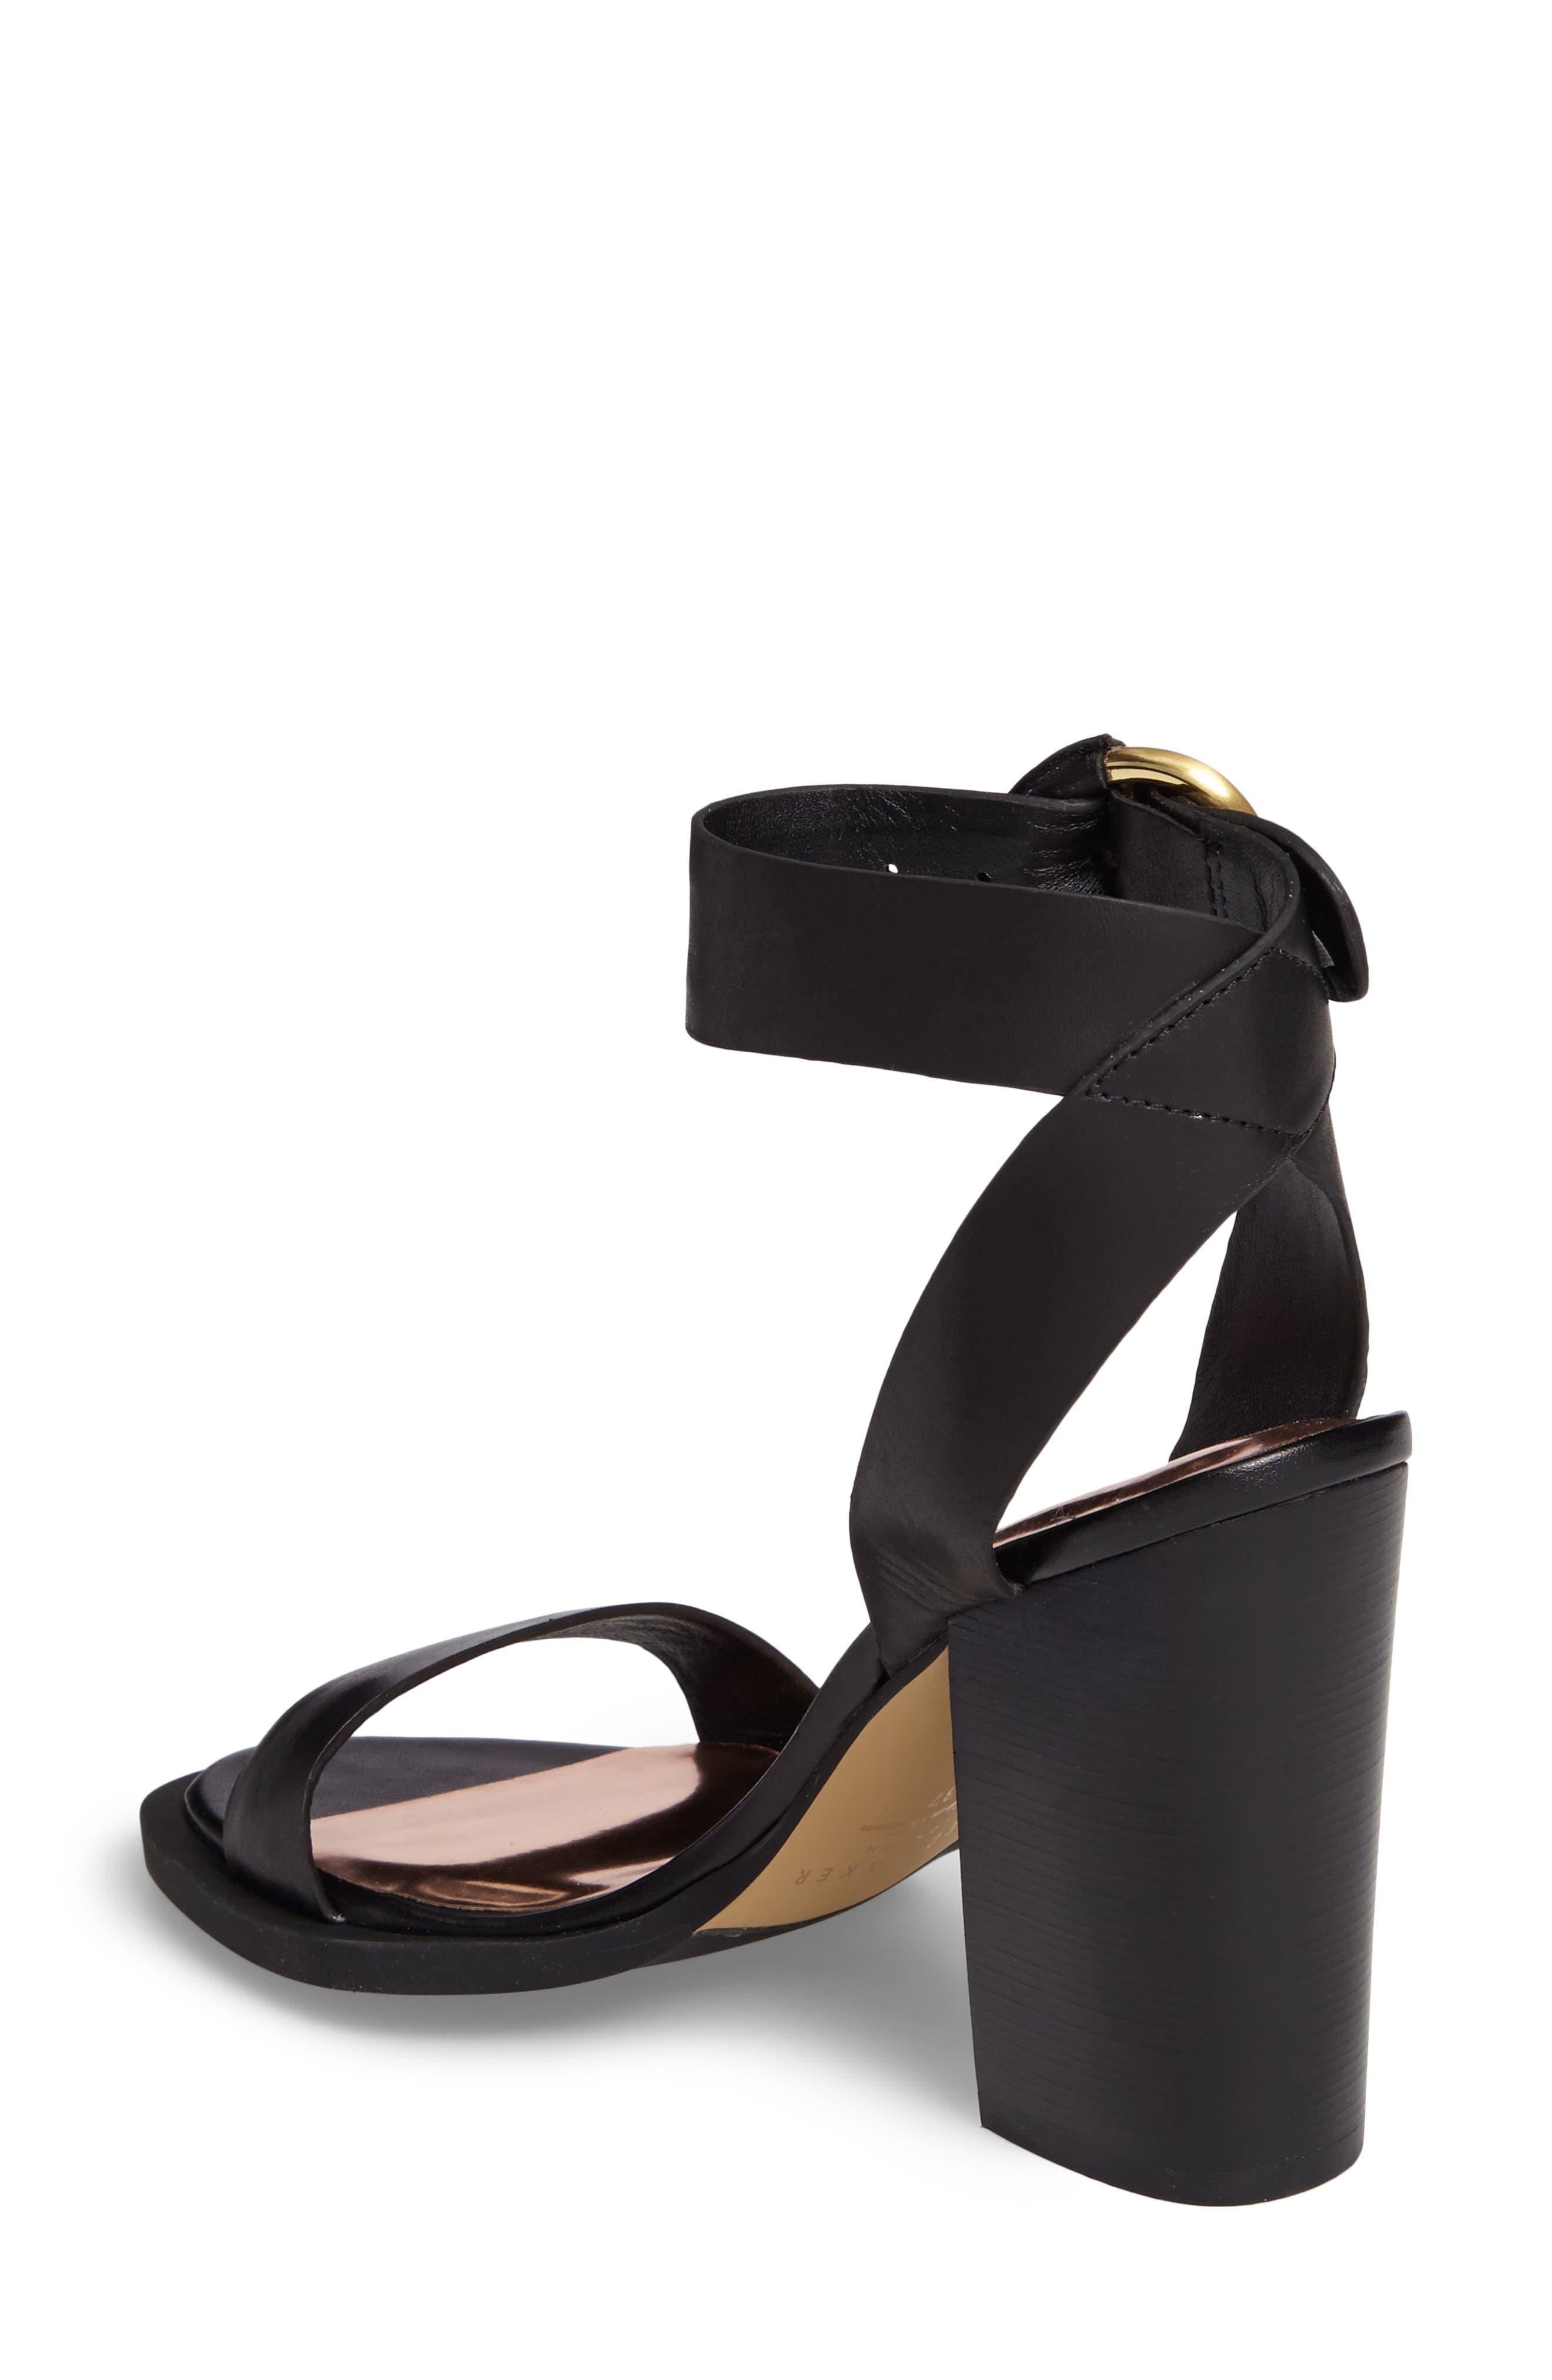 Betciy Ankle Strap Sandal,                             Alternate thumbnail 2, color,                             001